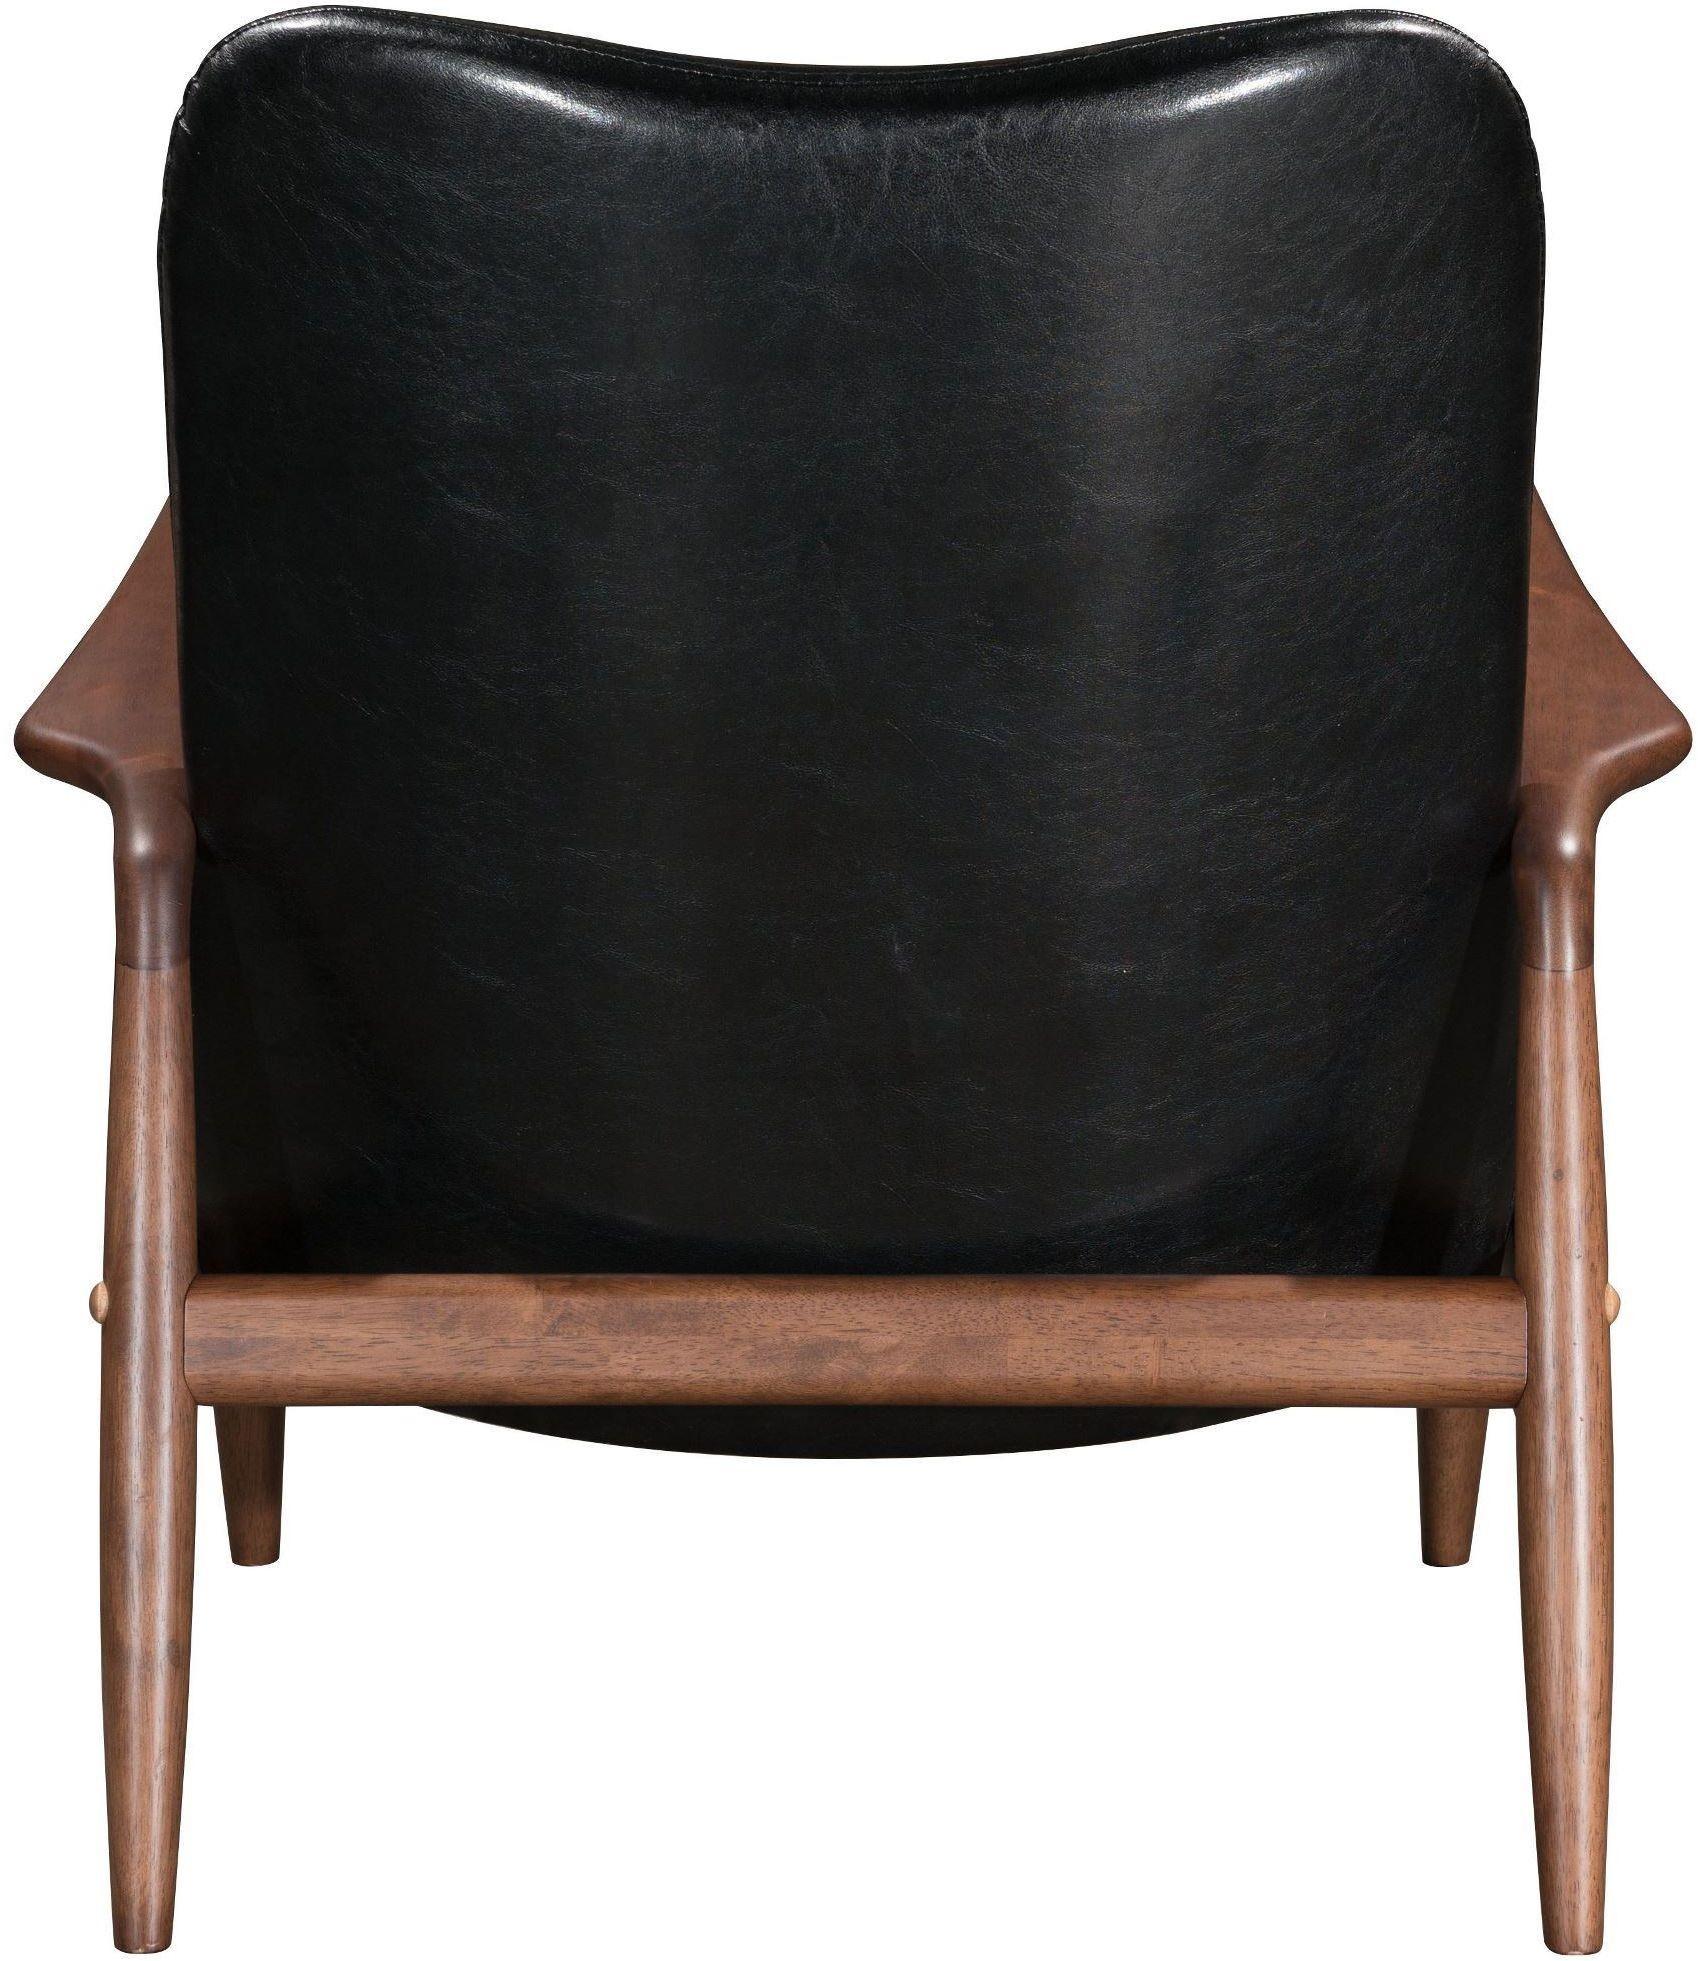 bully lounge chair ottoman